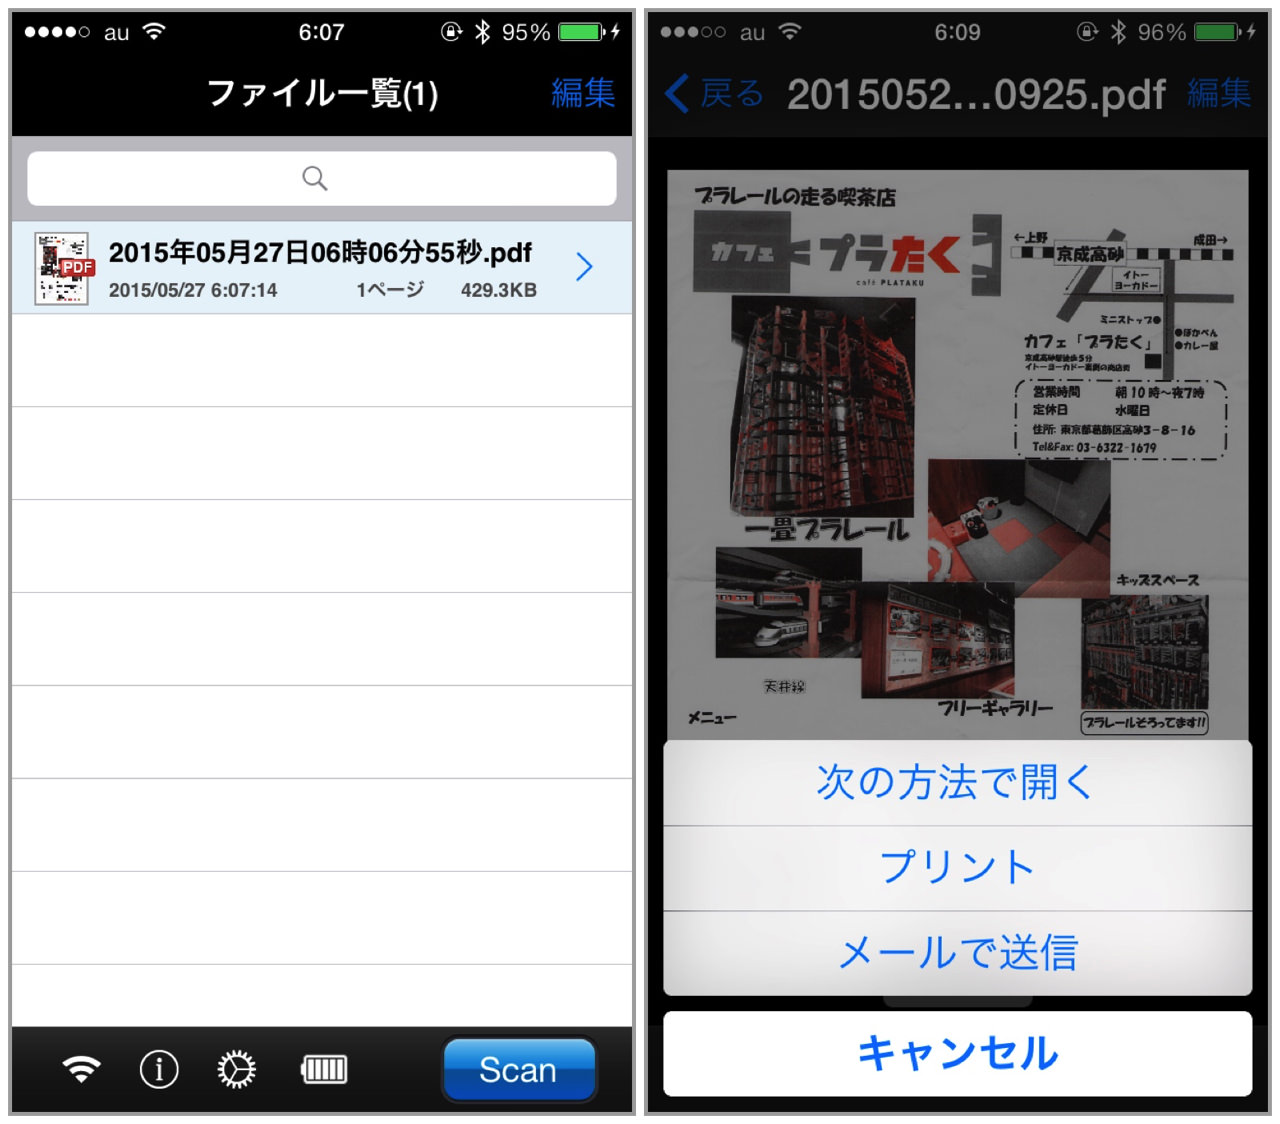 Fujitsu pfu scansnap ix100 snow white13